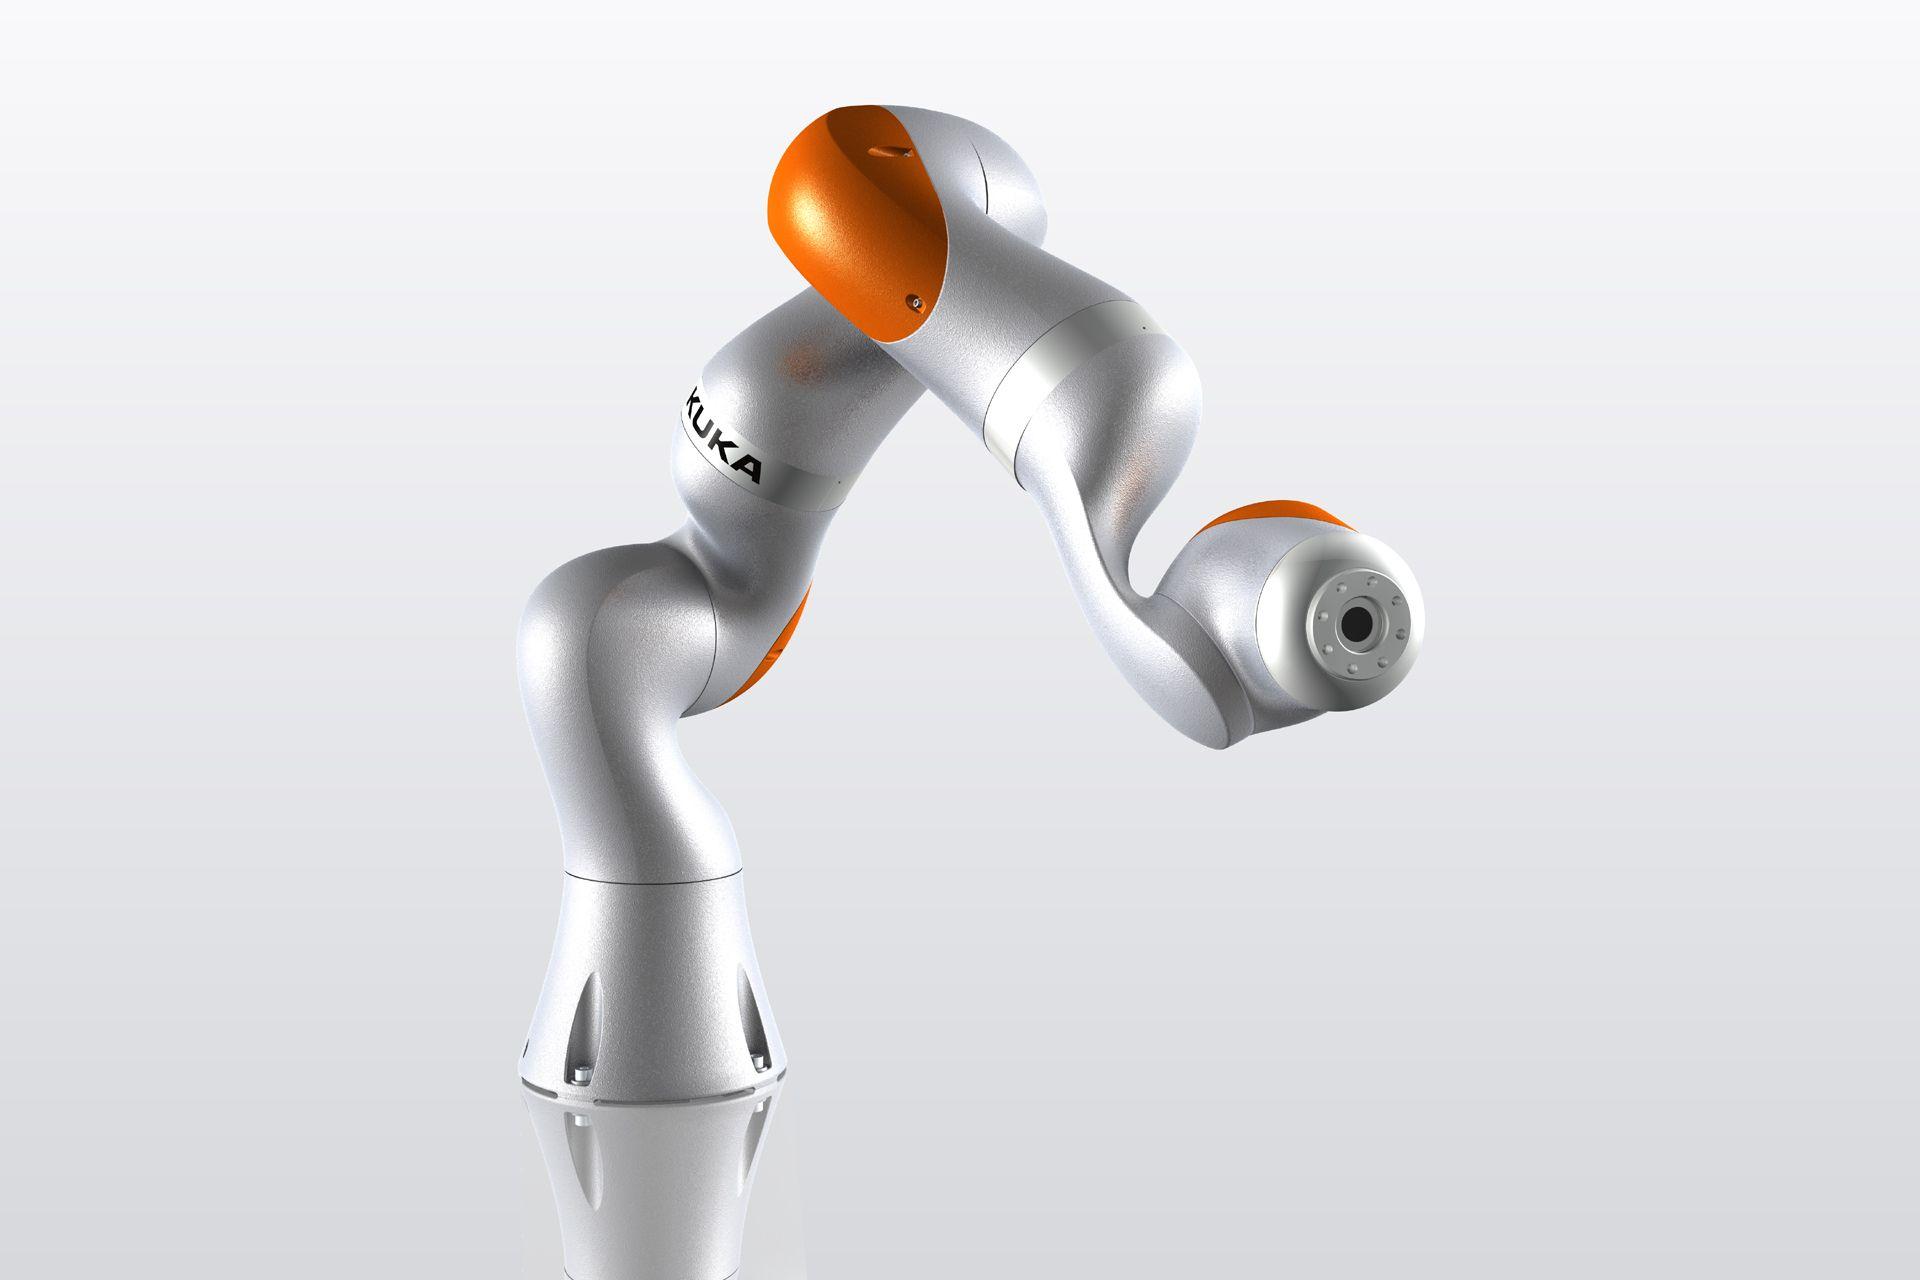 Kuka lbr iiwa intelligent industrial work assistant designed by mario selic